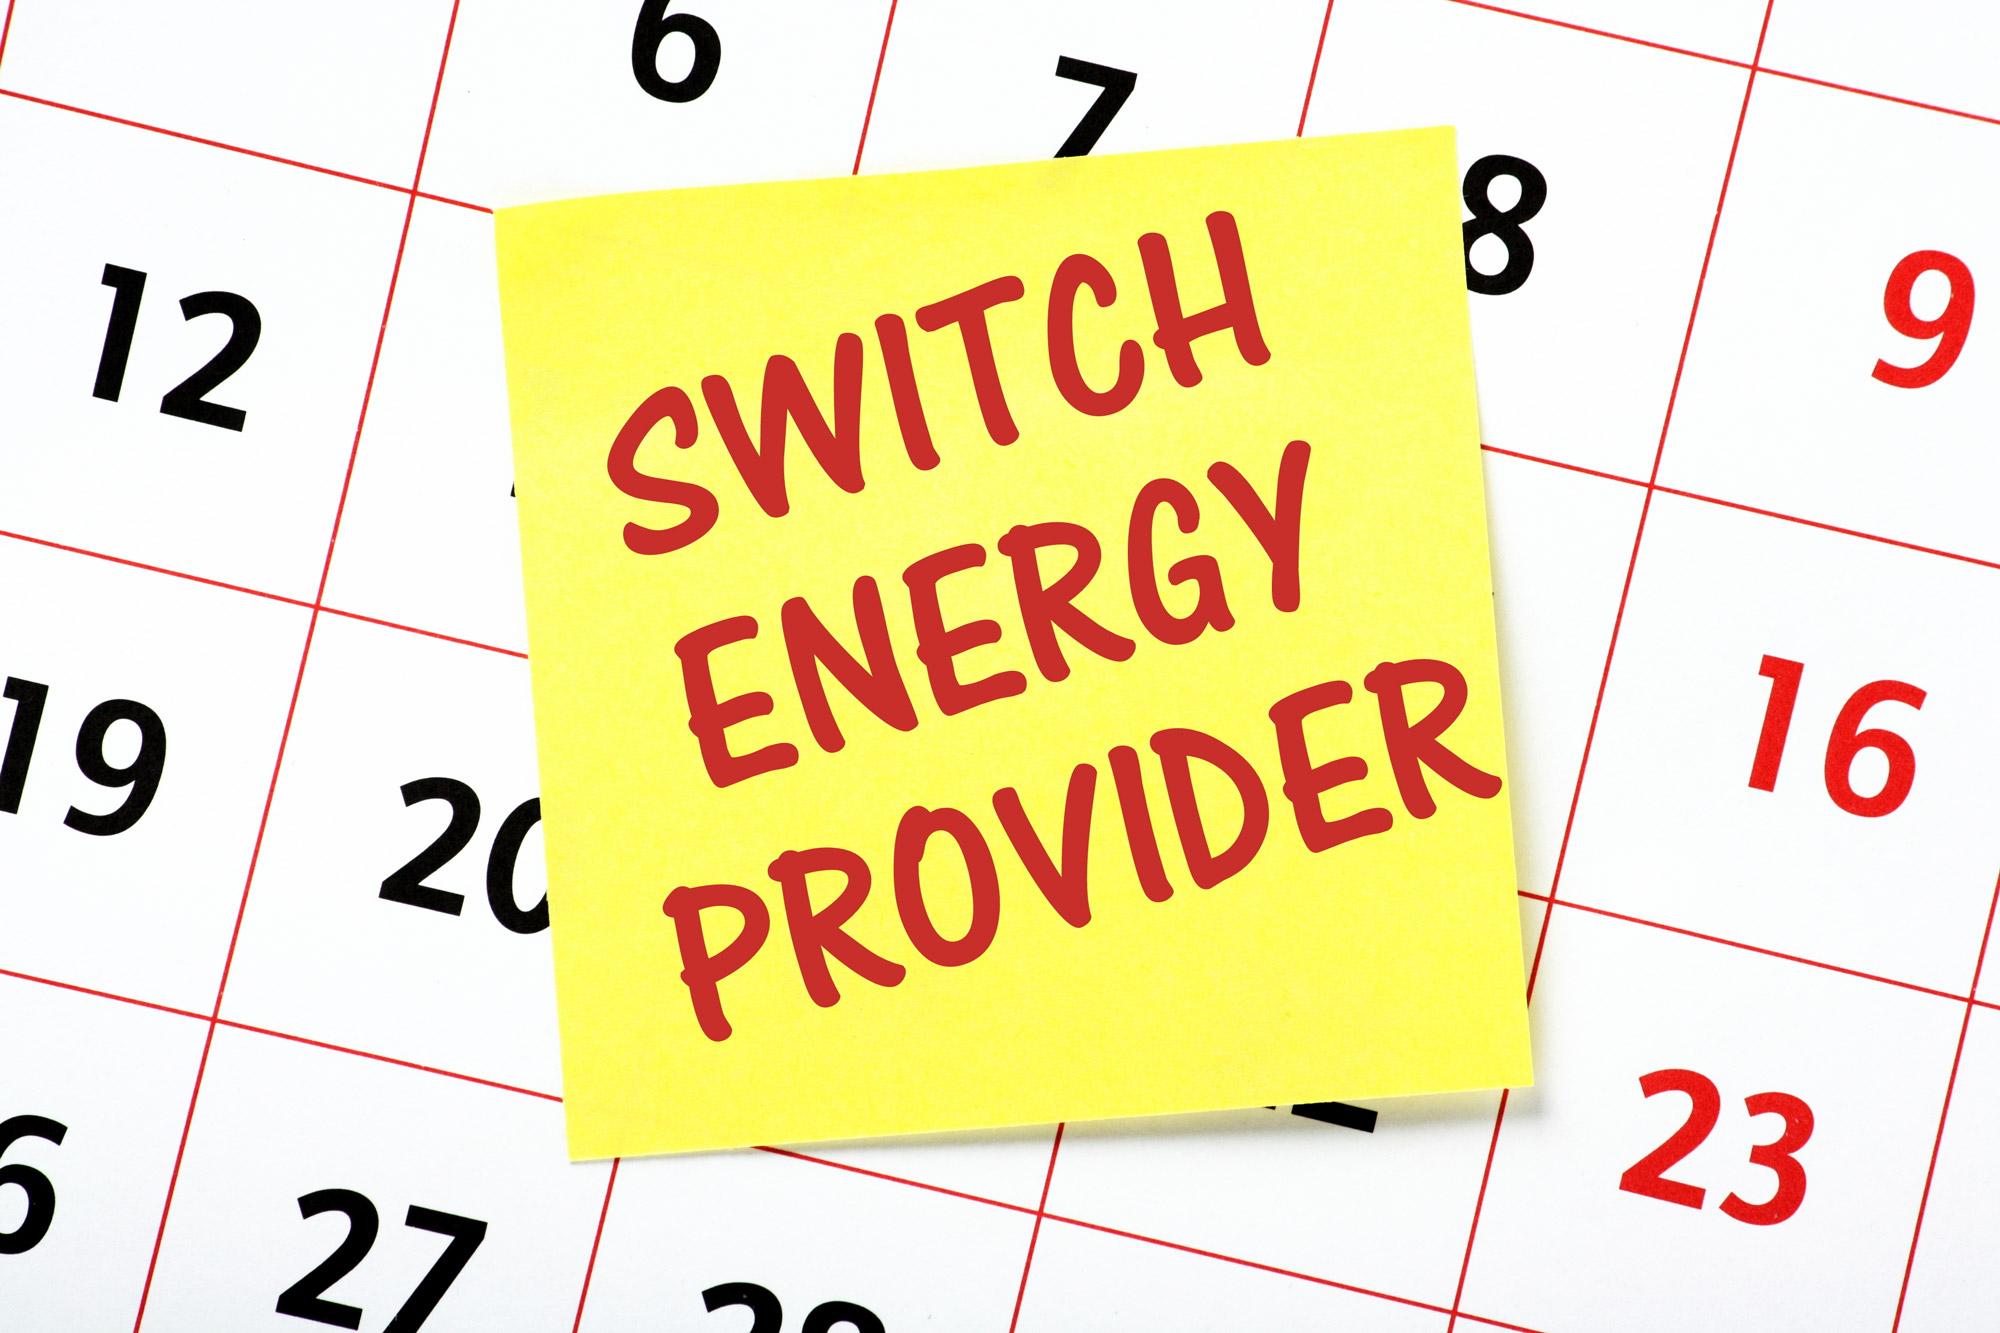 https://watt.co.uk/wp-content/uploads/2016/09/change-energy-supplier-1.jpg